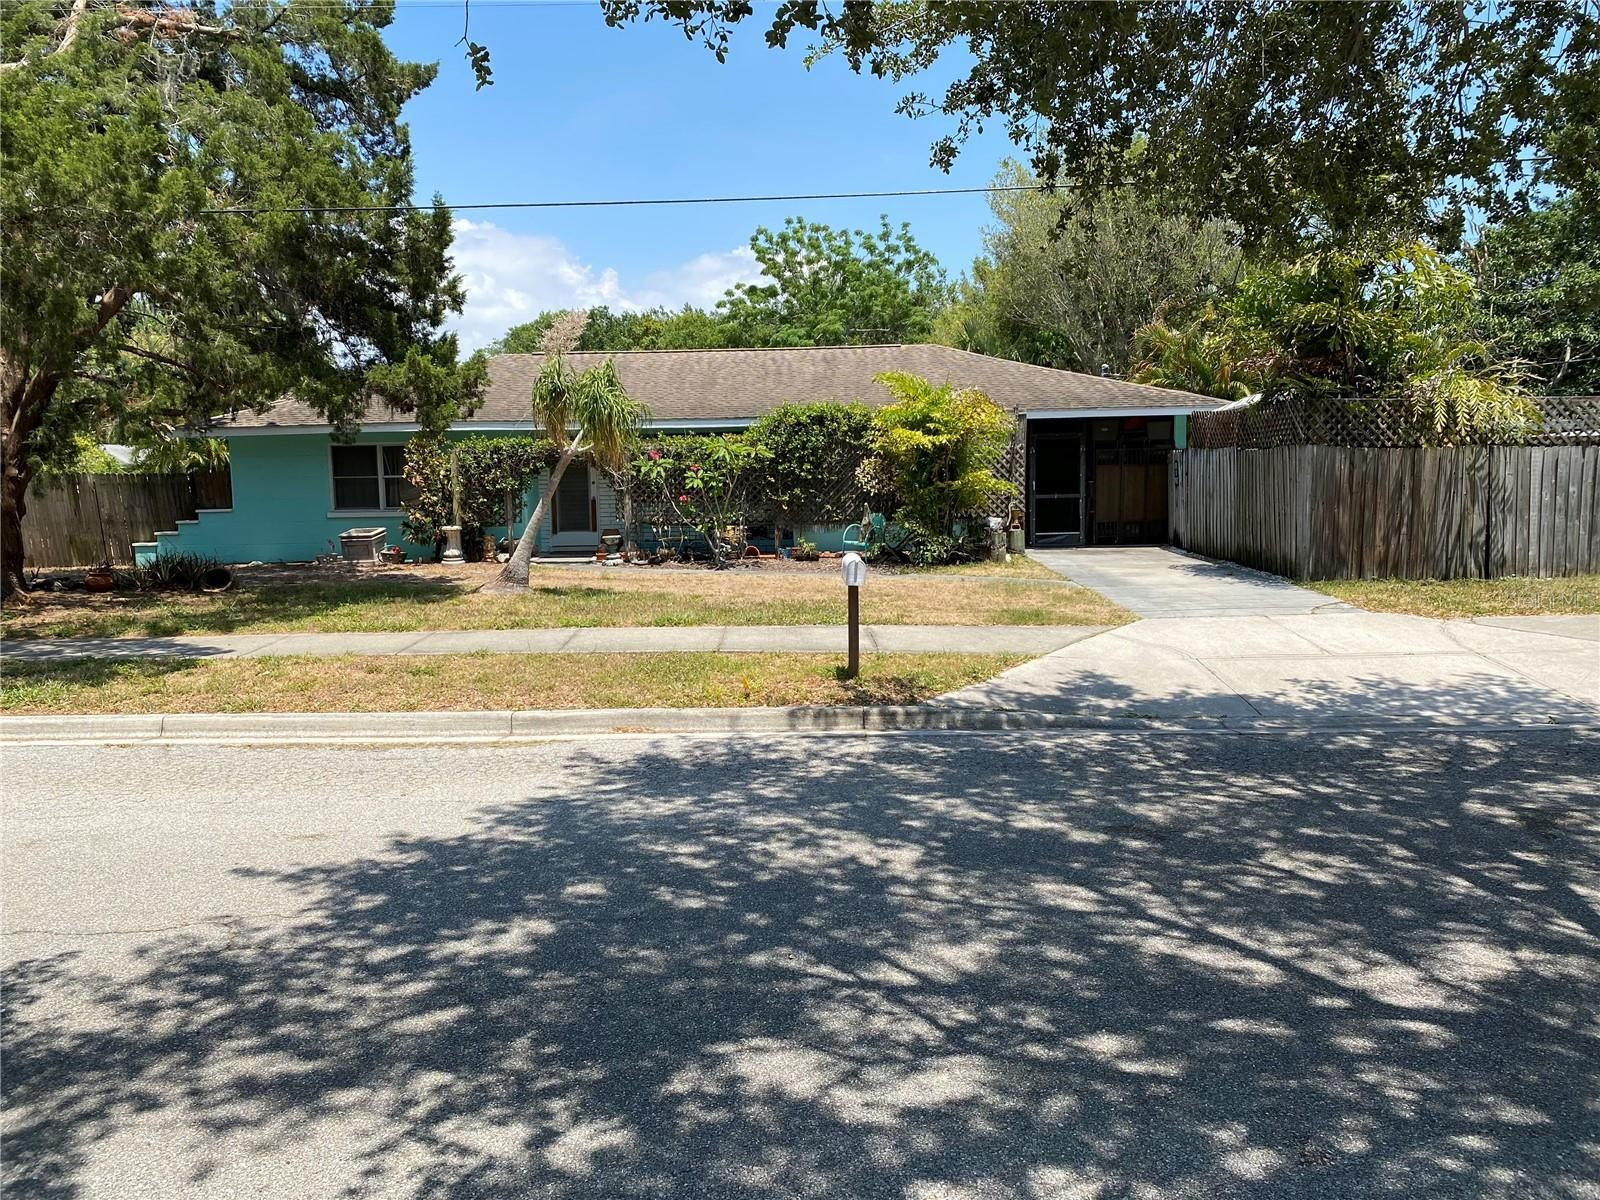 2611 S EAST AVENUE, Sarasota, FL 34239 - MLS#: U8125982